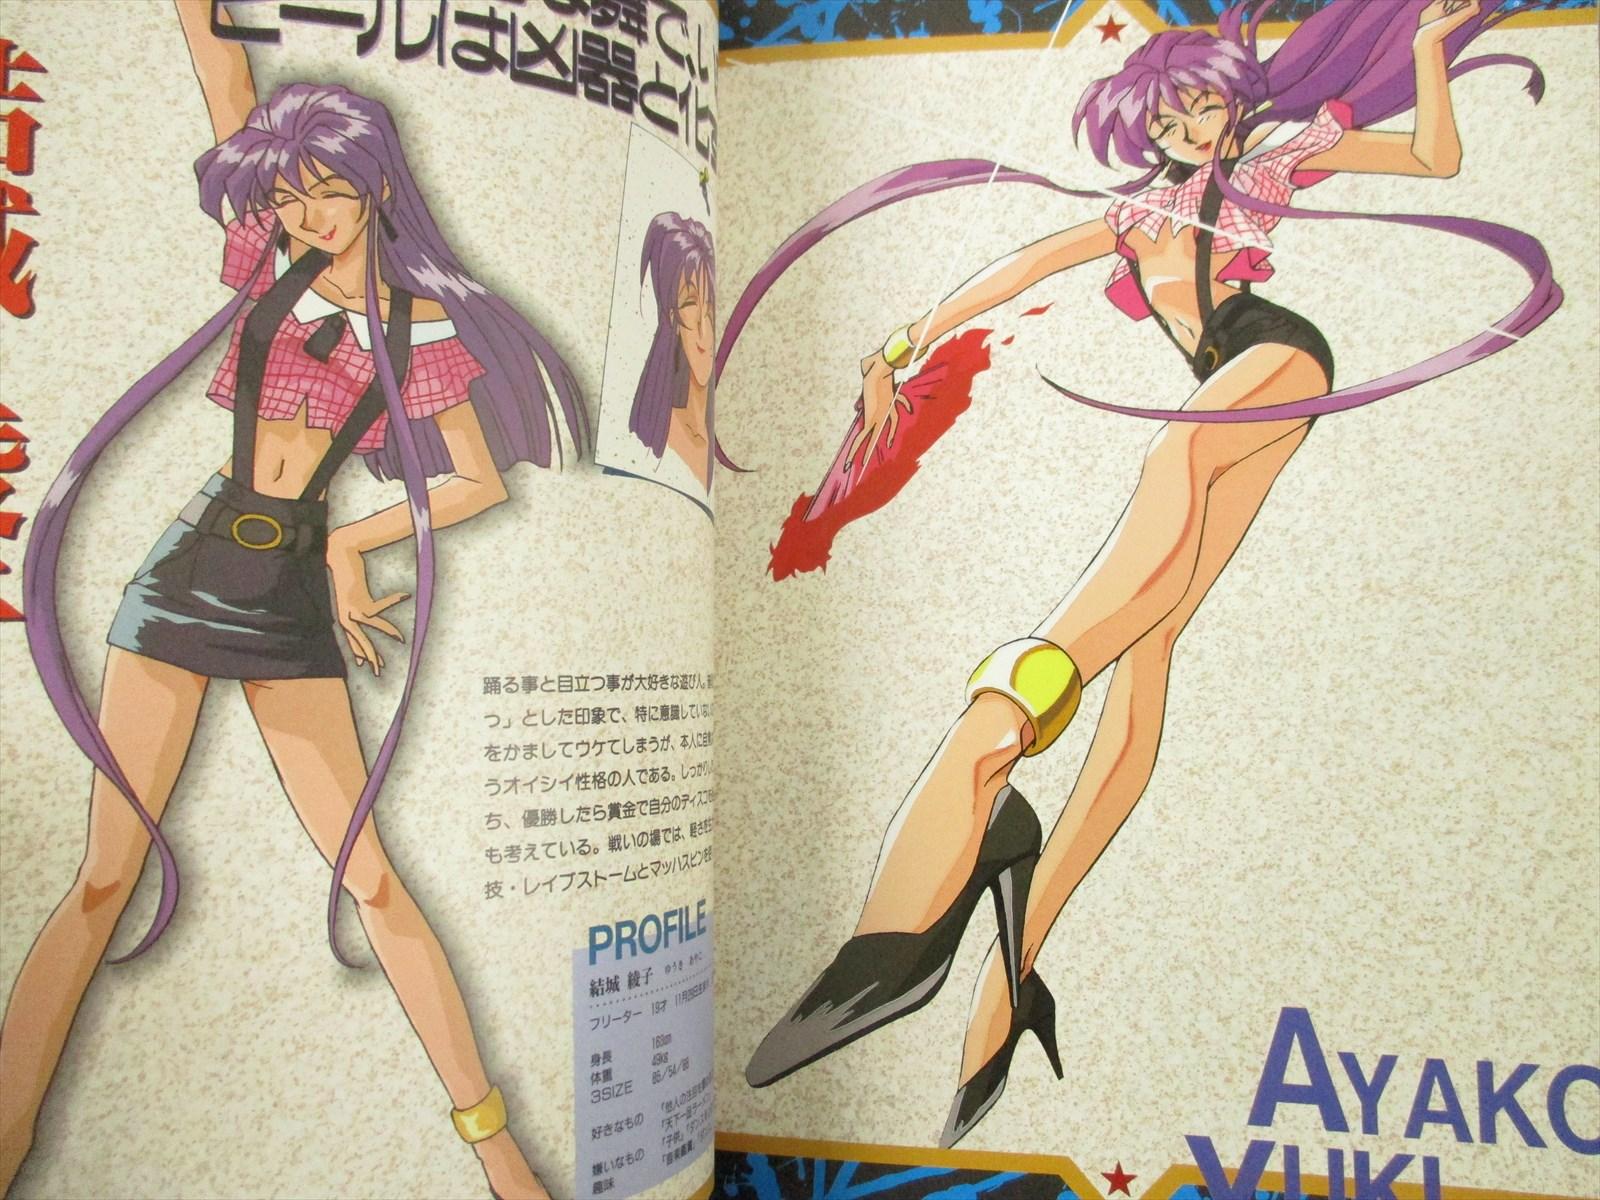 V.G Variable Geo Saikyo Bishojo Densetsu Art Works PC Engine Fan Book 1994